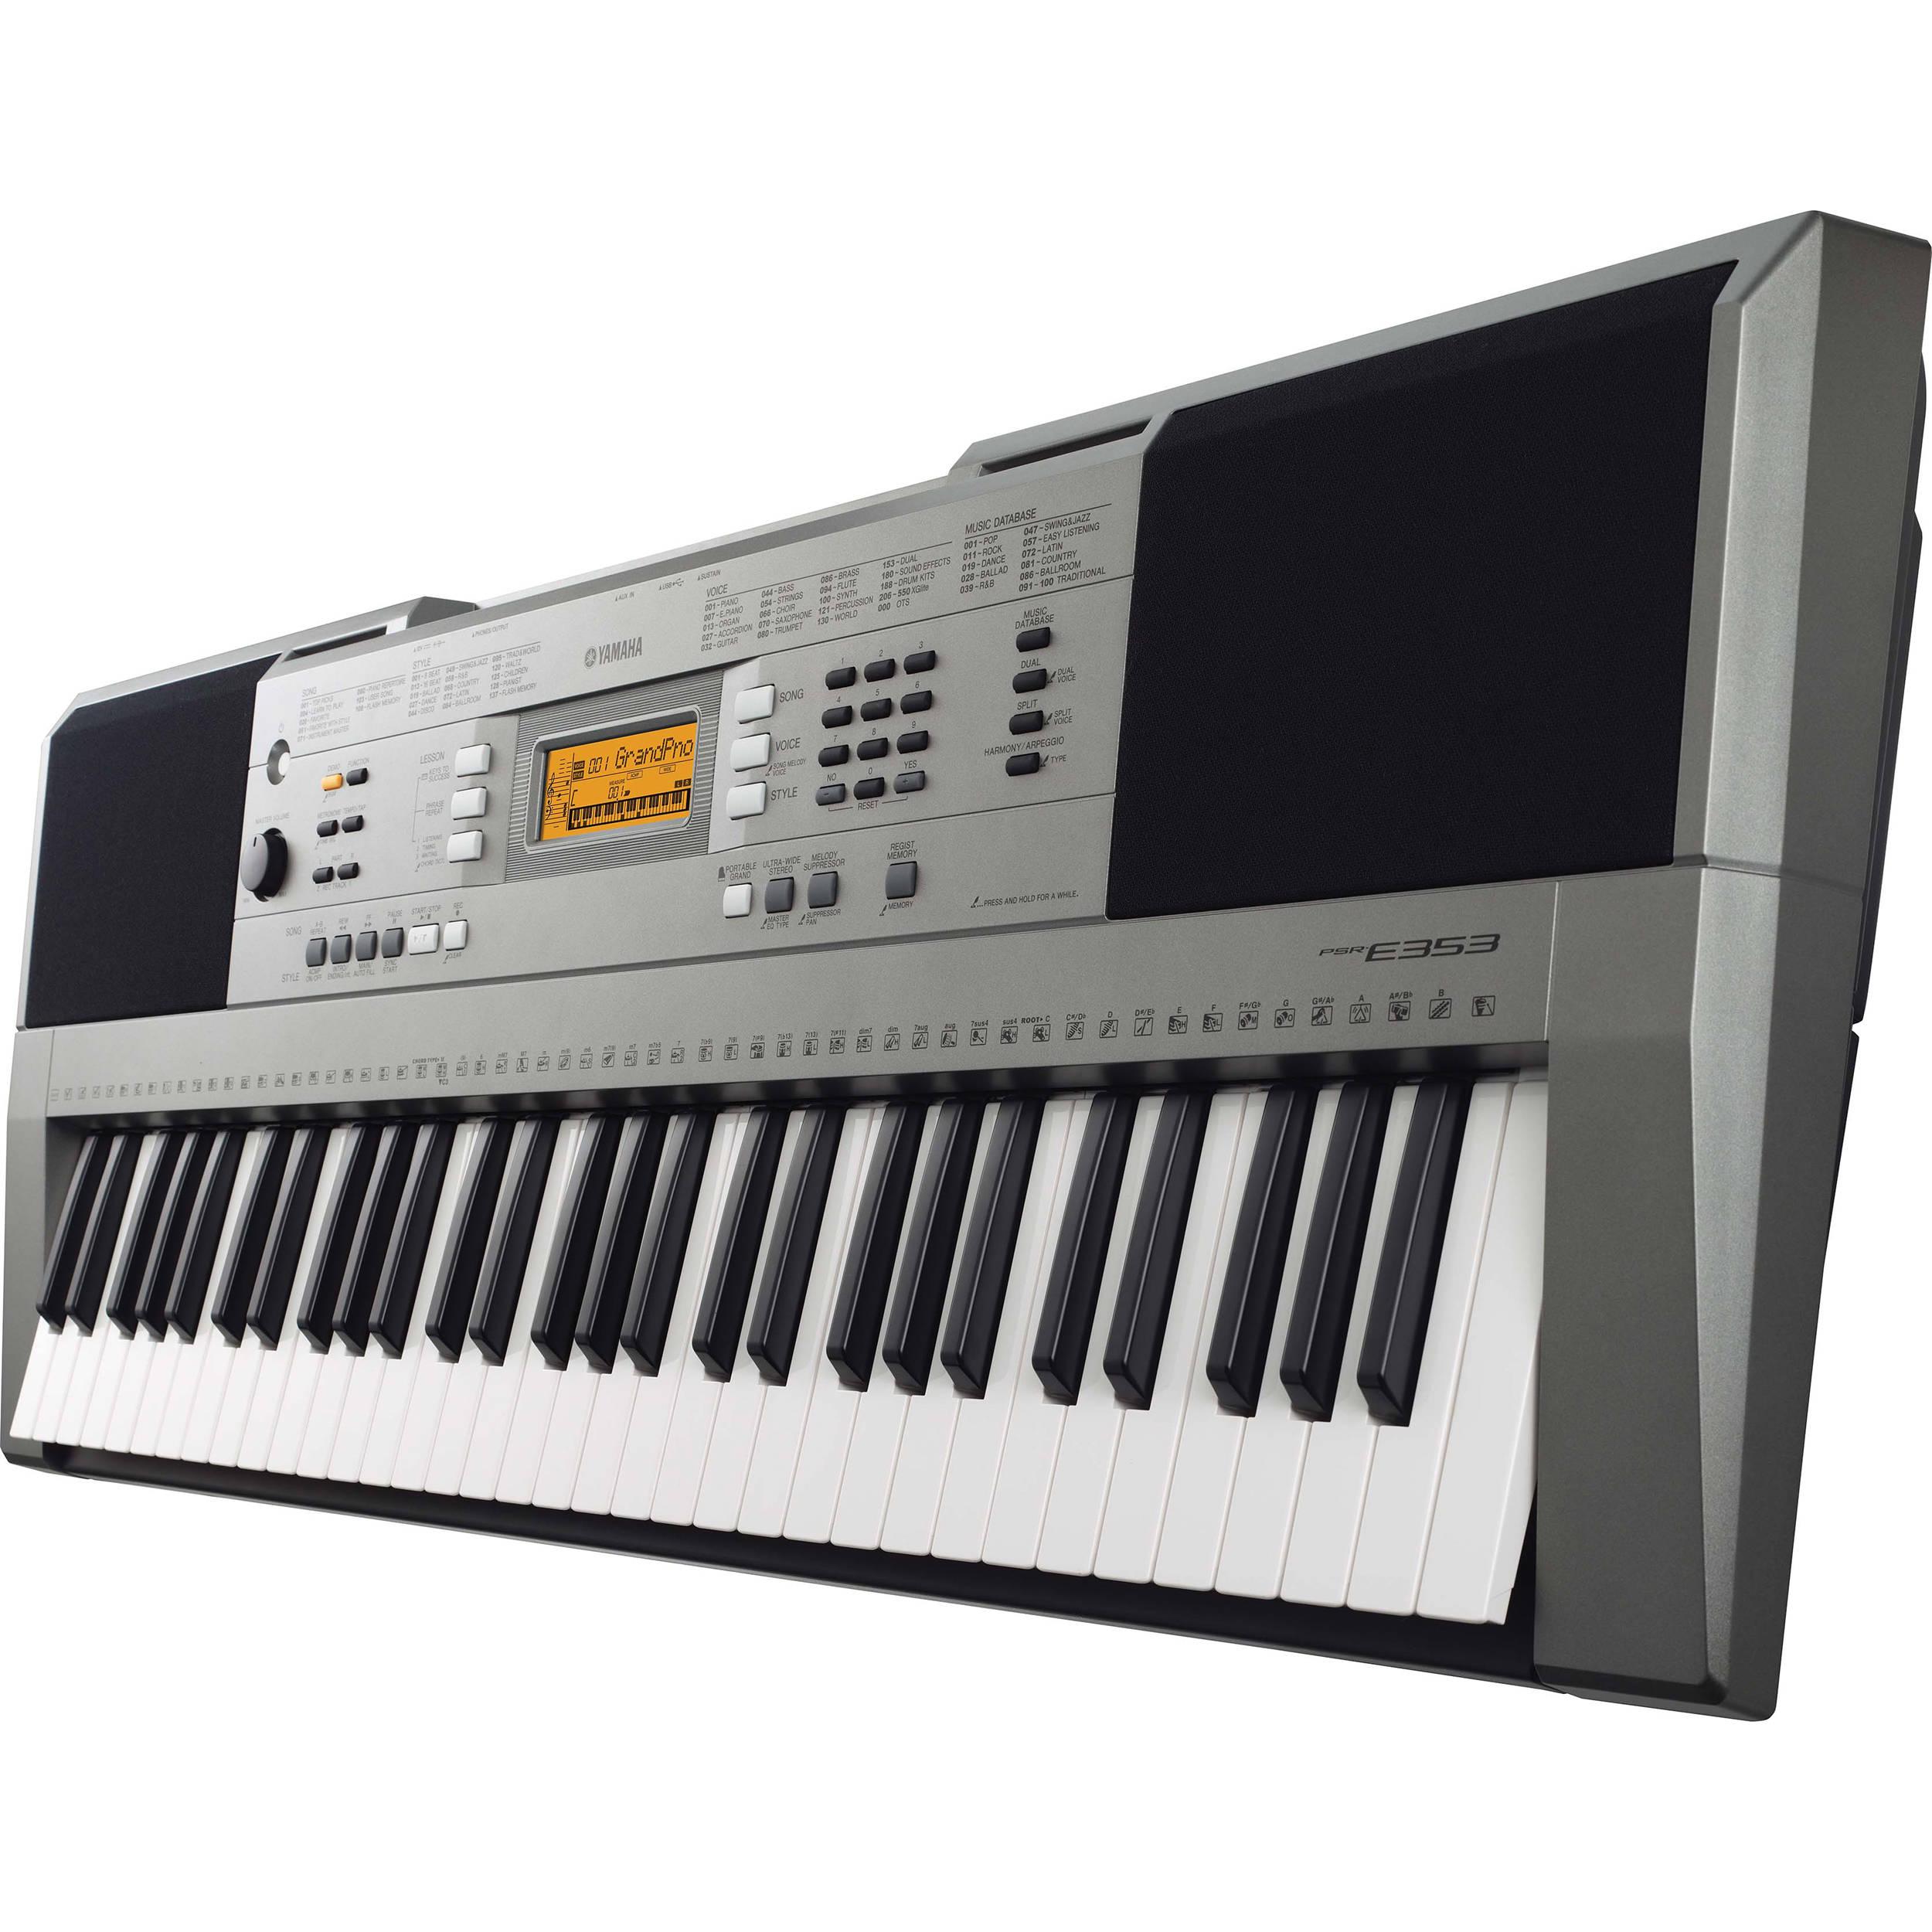 yamaha psr e353 portable keyboard no power adapter psre353